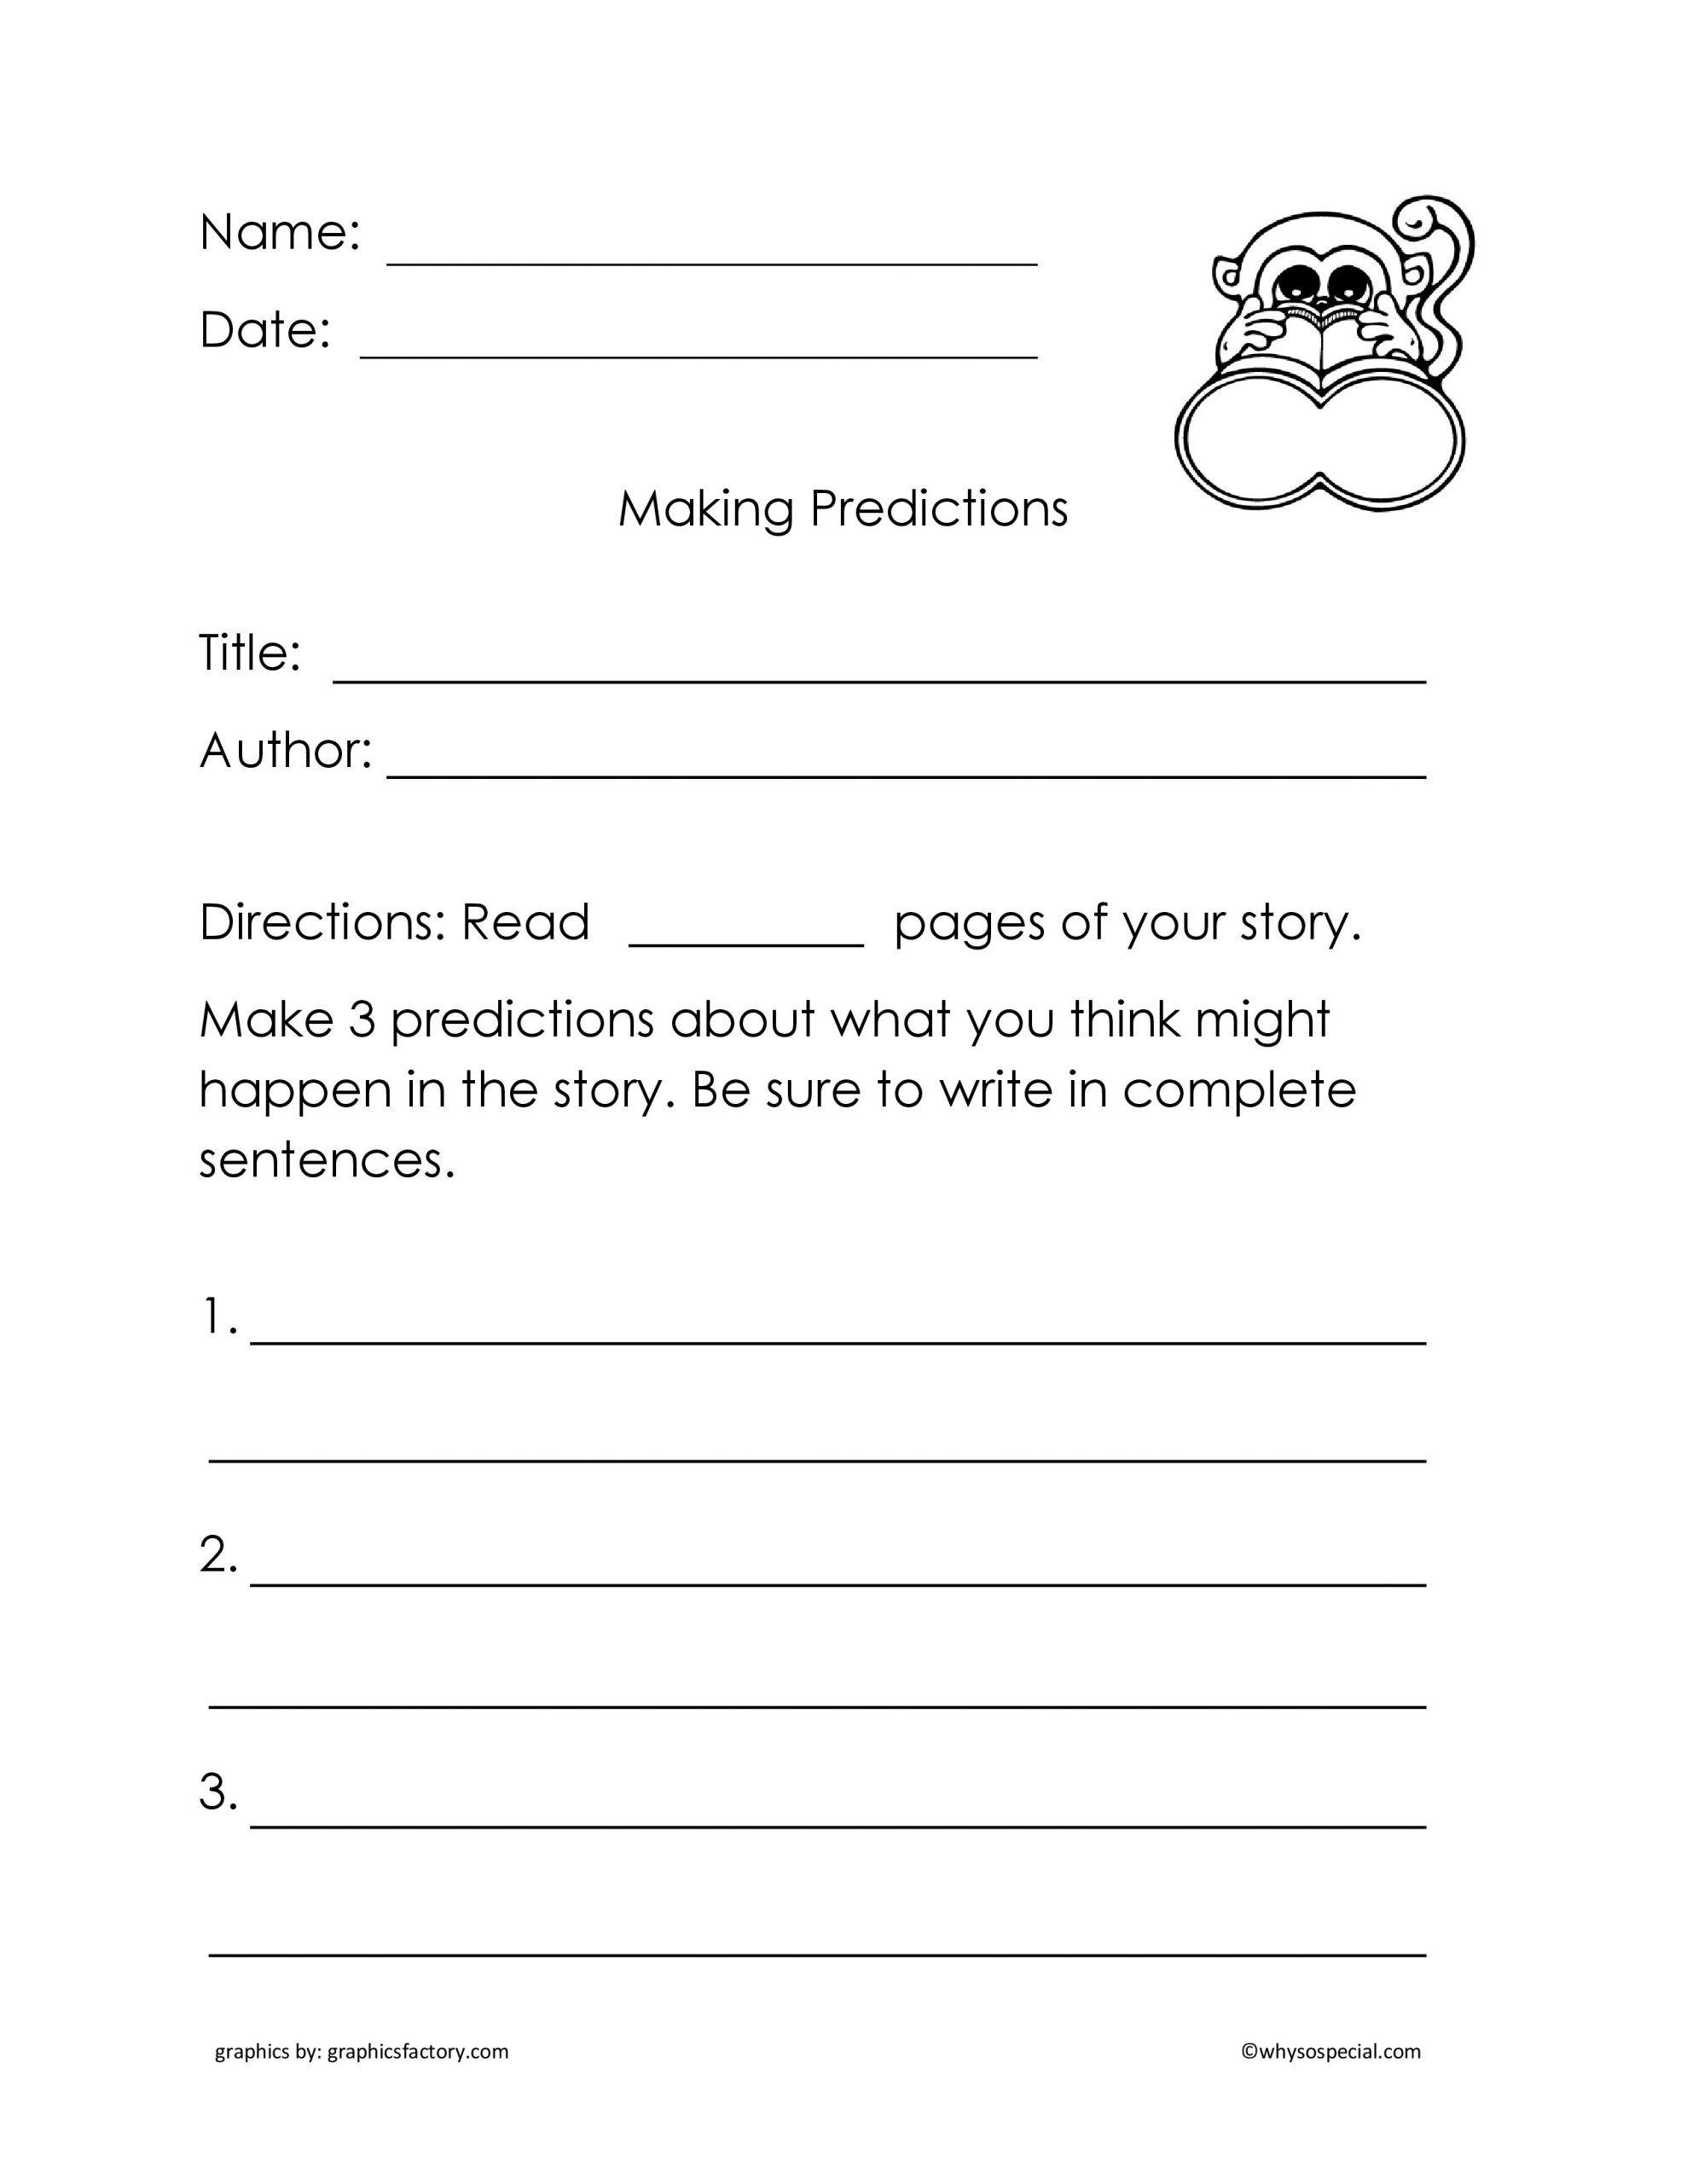 medium resolution of Making Predictions Worksheets 3rd Grade in 2020   Kindergarten worksheets